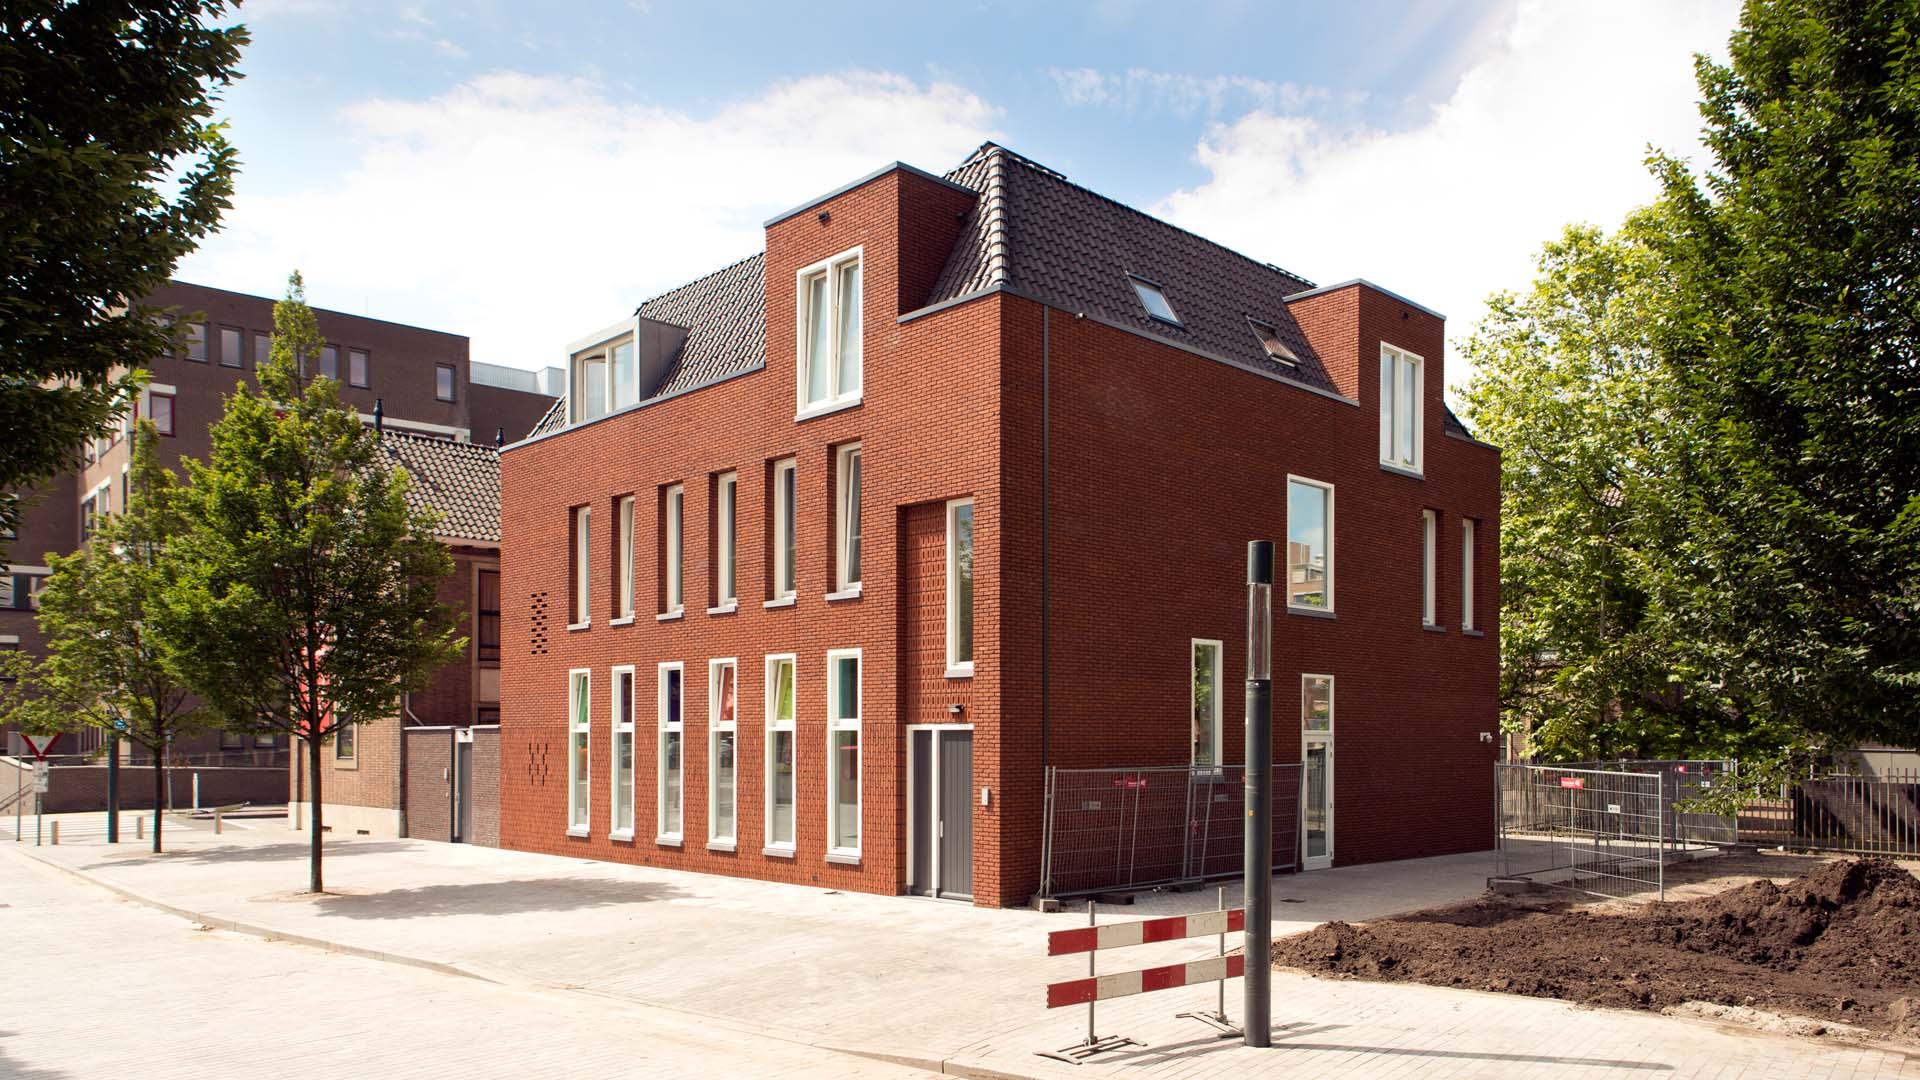 1318_Leger des Heils Molenweg Willem Brakmanstraat Enschede_02